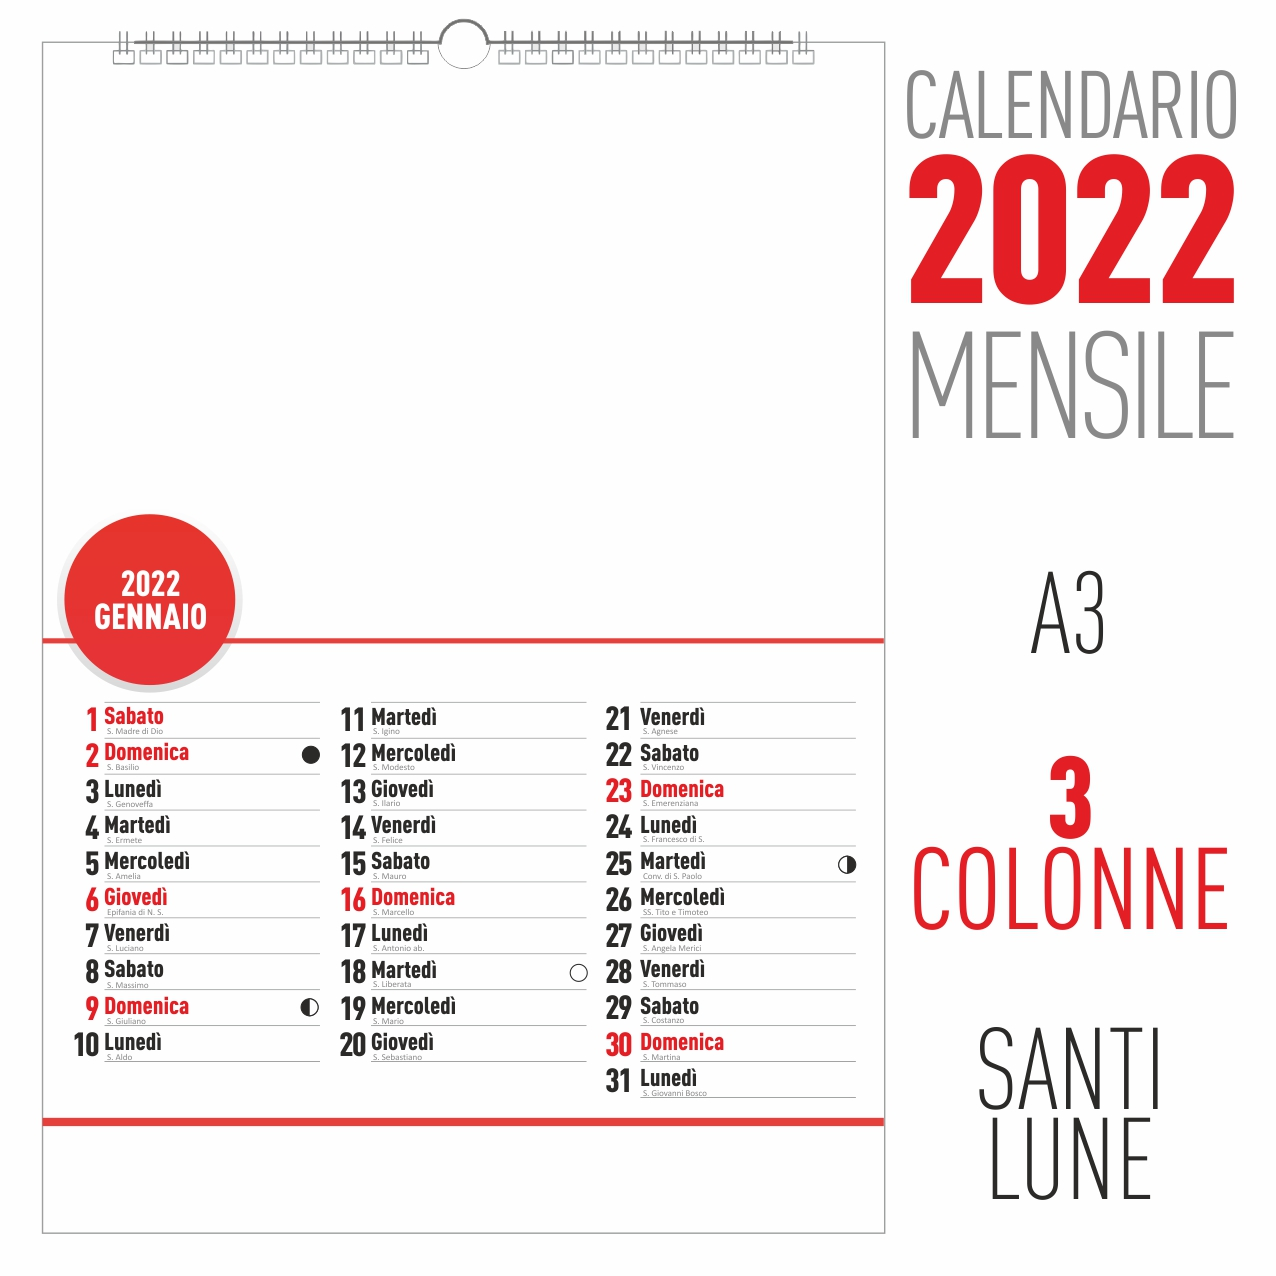 calendario 2022 mensile 3 colonne